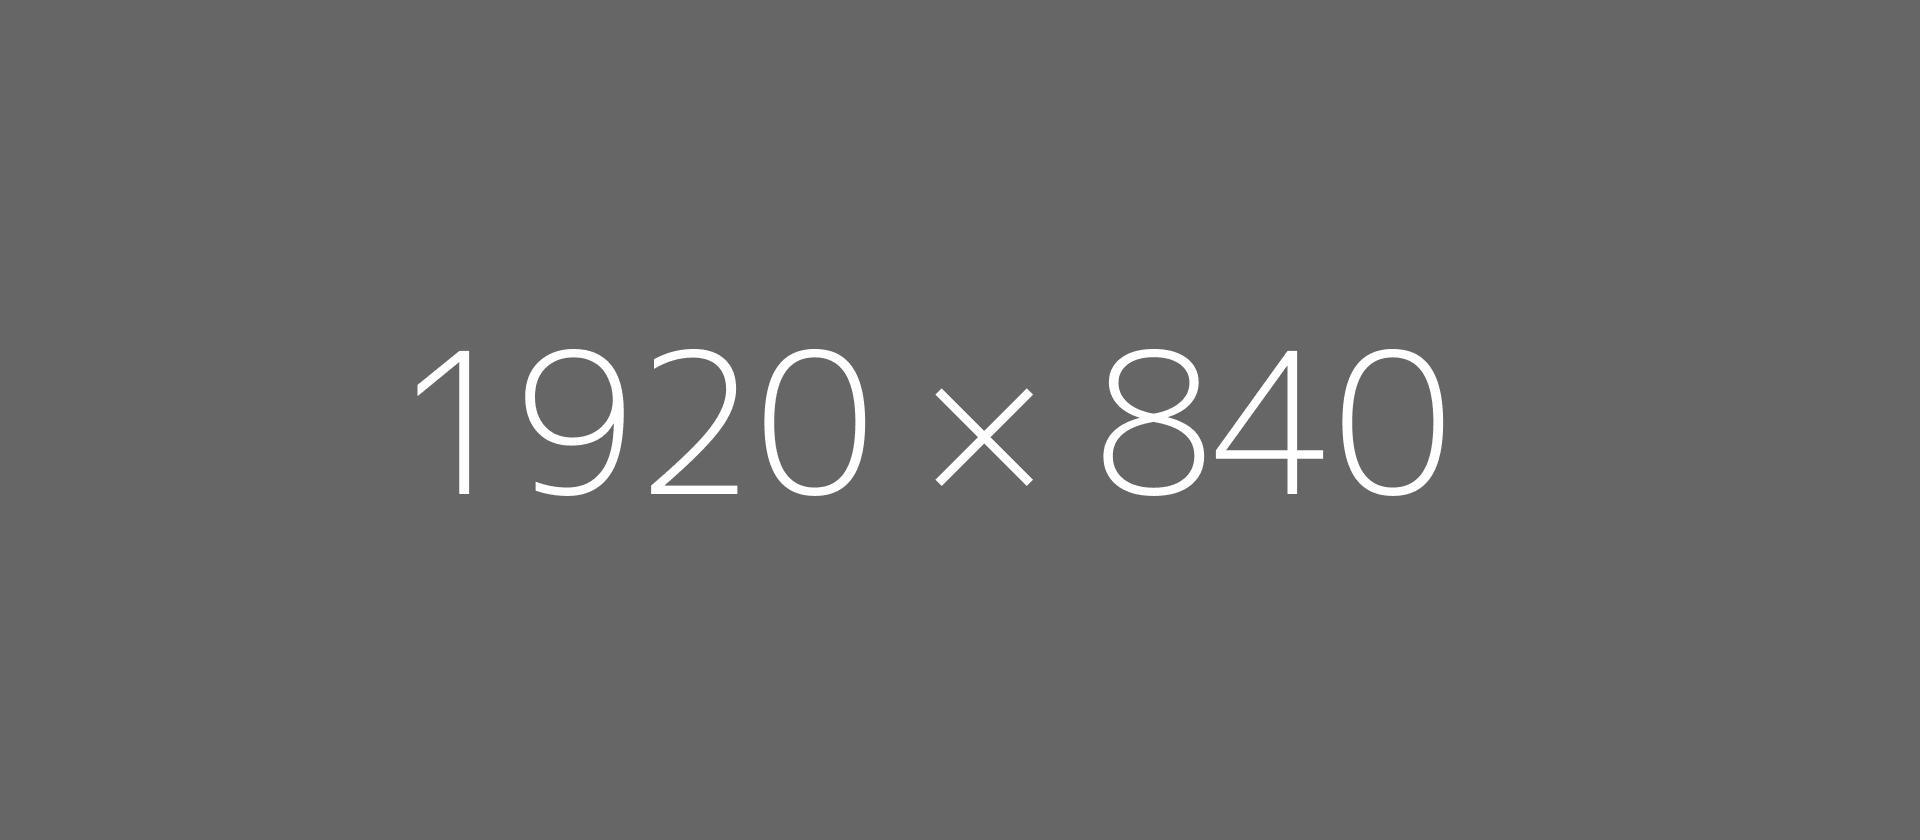 1920x840